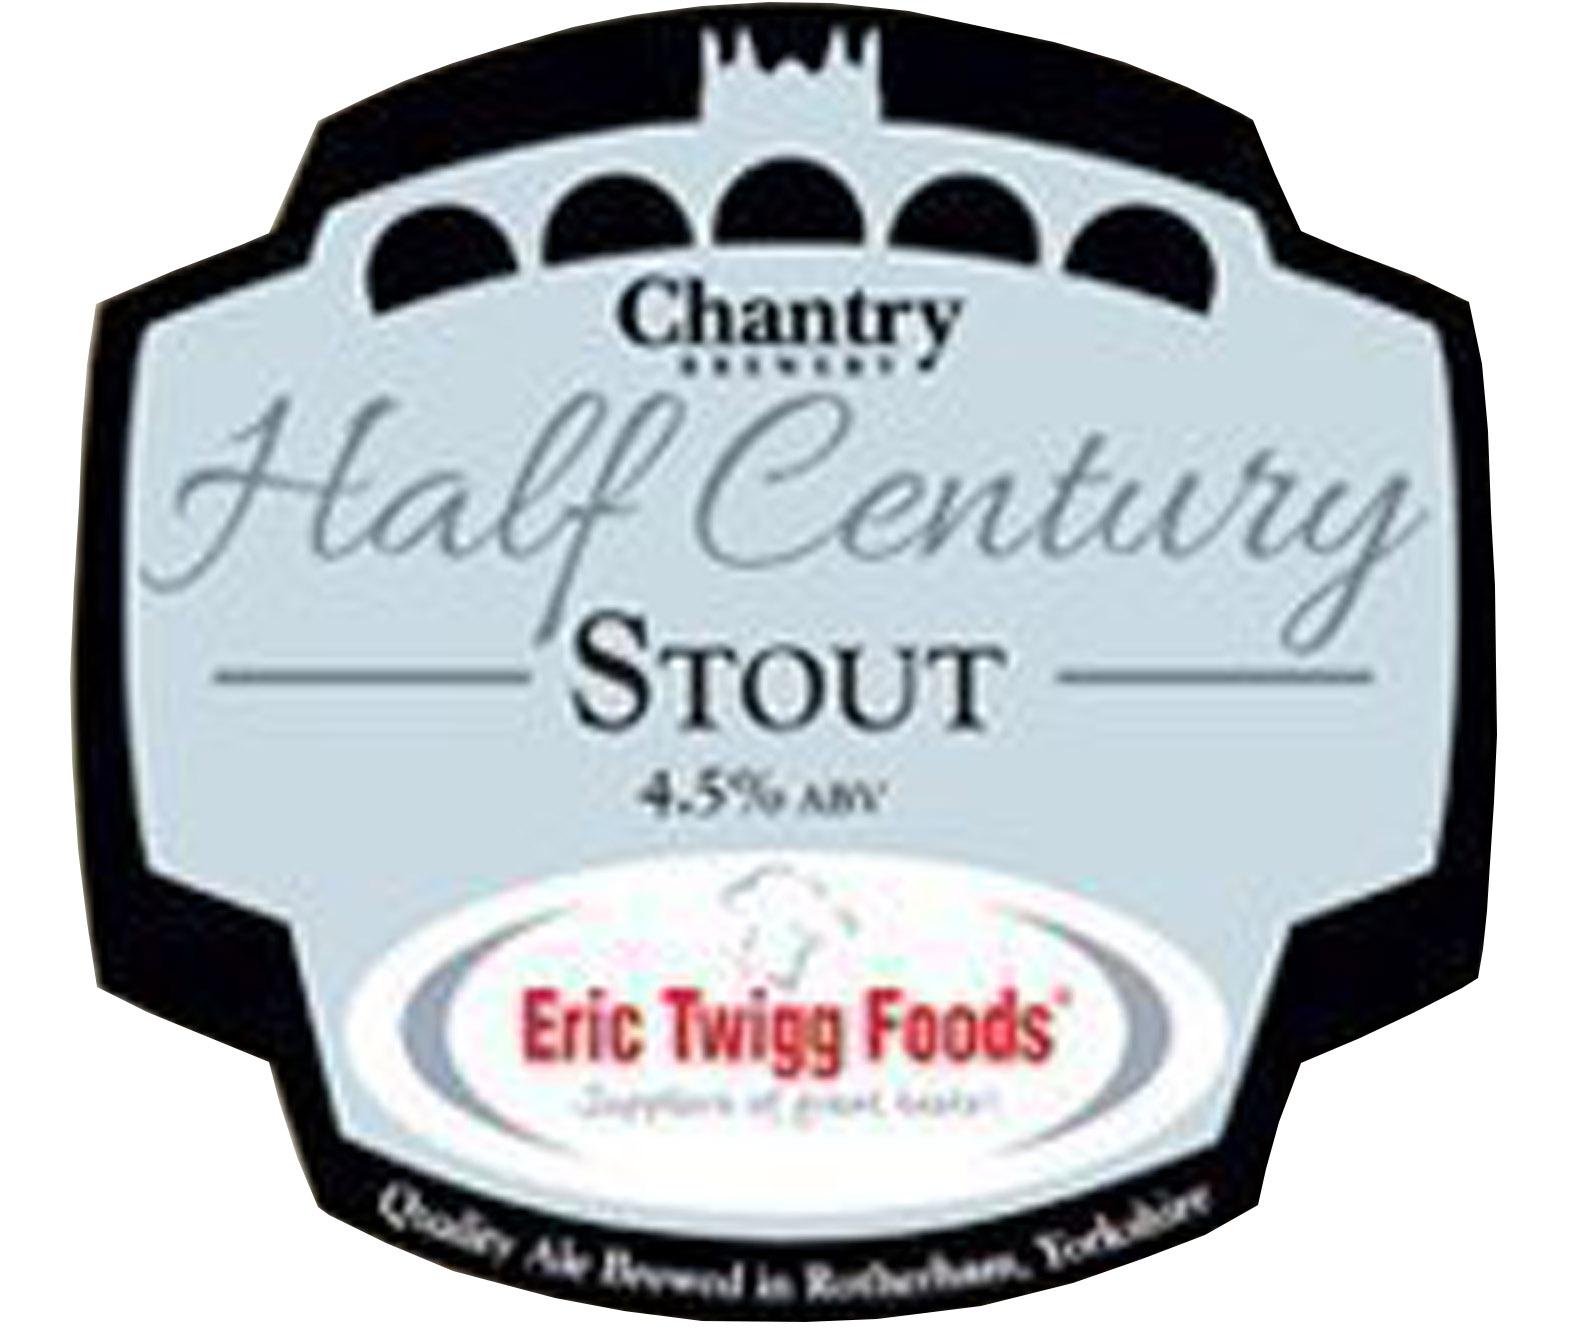 Chantry Brewery Half Century Stout